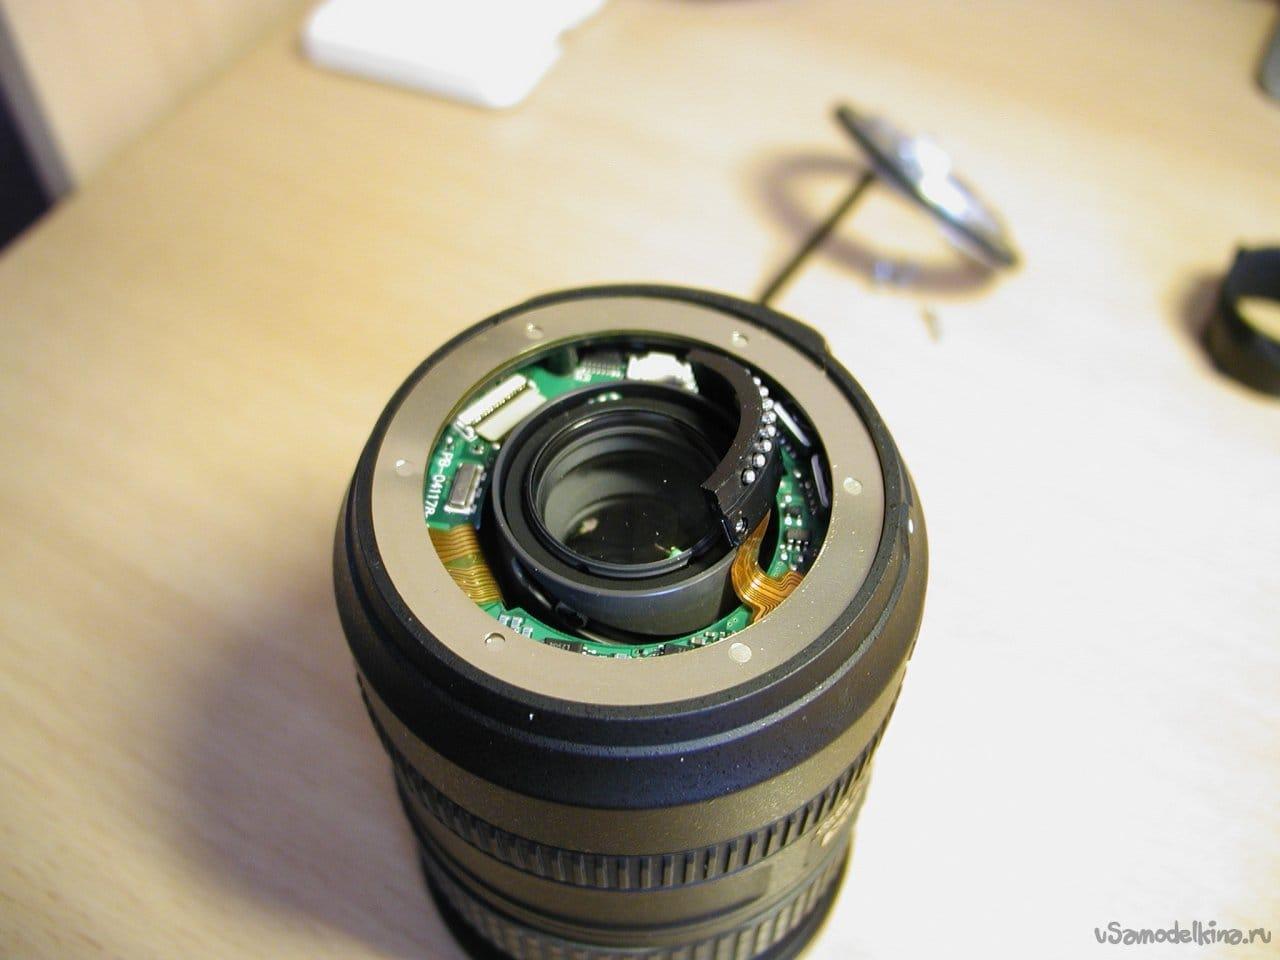 Repair of the lens Nikon DX AF-S Nikkor 18-200mm 1: 3.5-5.6G ED SWM VR IF Aspherical